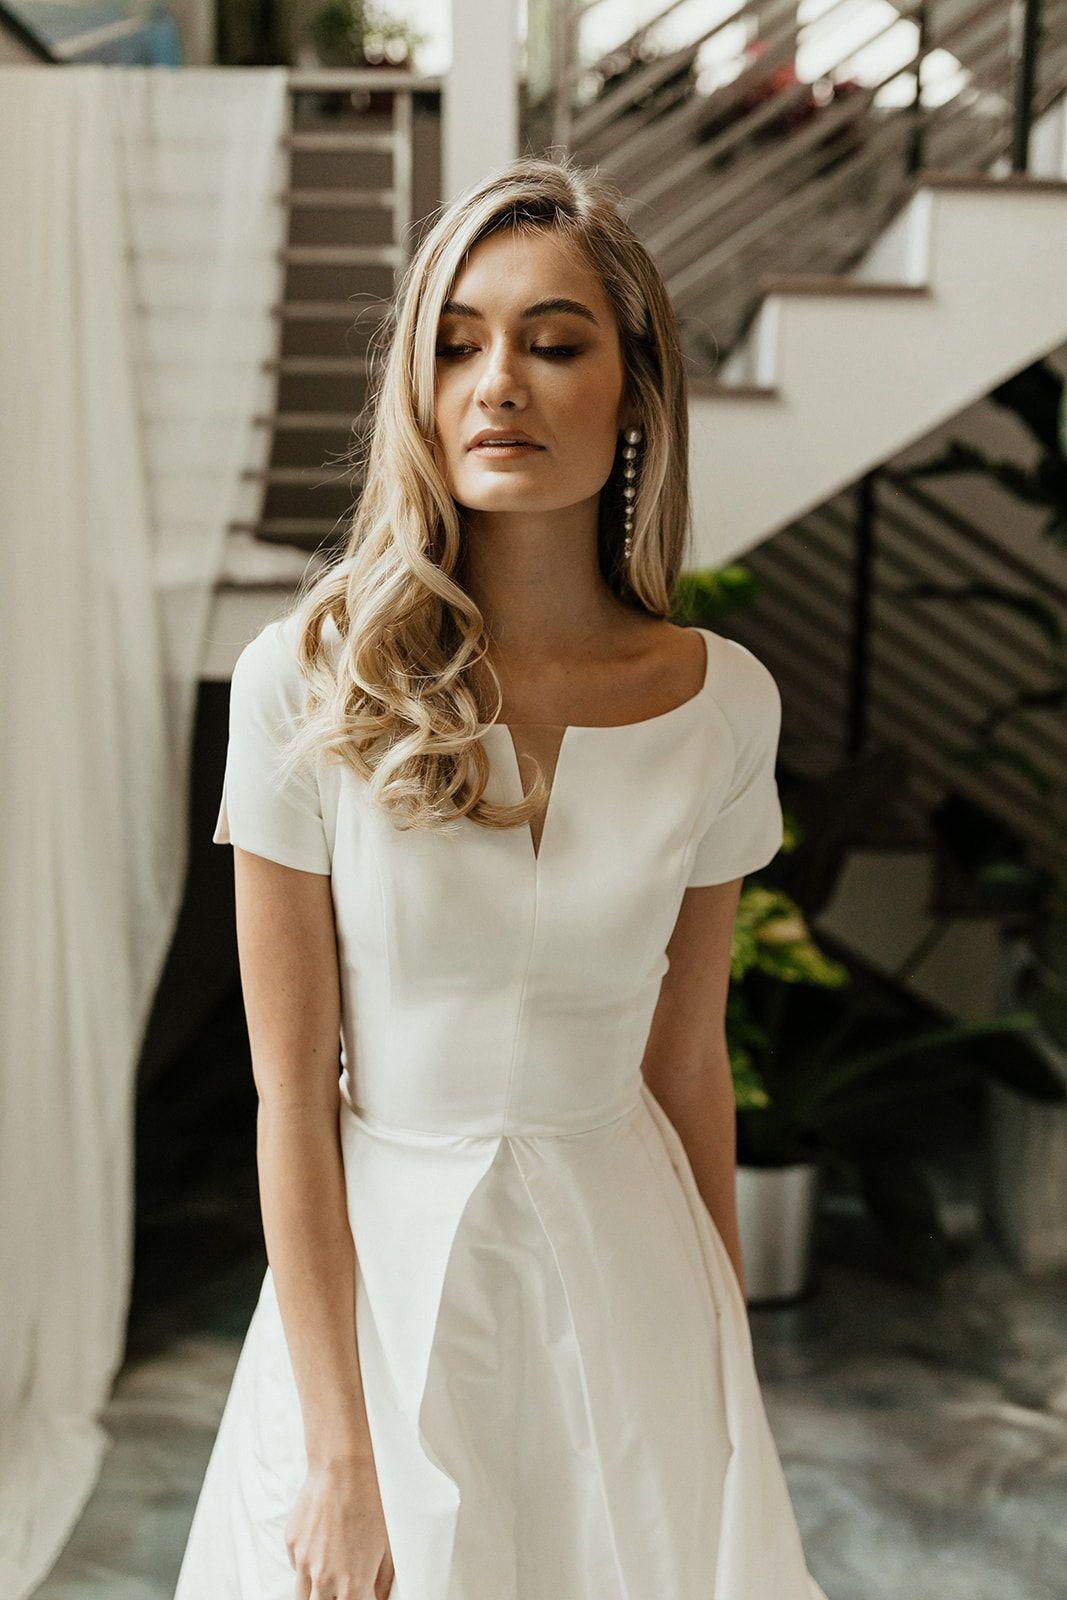 9 Dress With Sleeves Formal Modest Wedding Short Sleeve Wedding Dress Modest Wedding Dresses Boat Neck Wedding Dress [ 1600 x 1067 Pixel ]